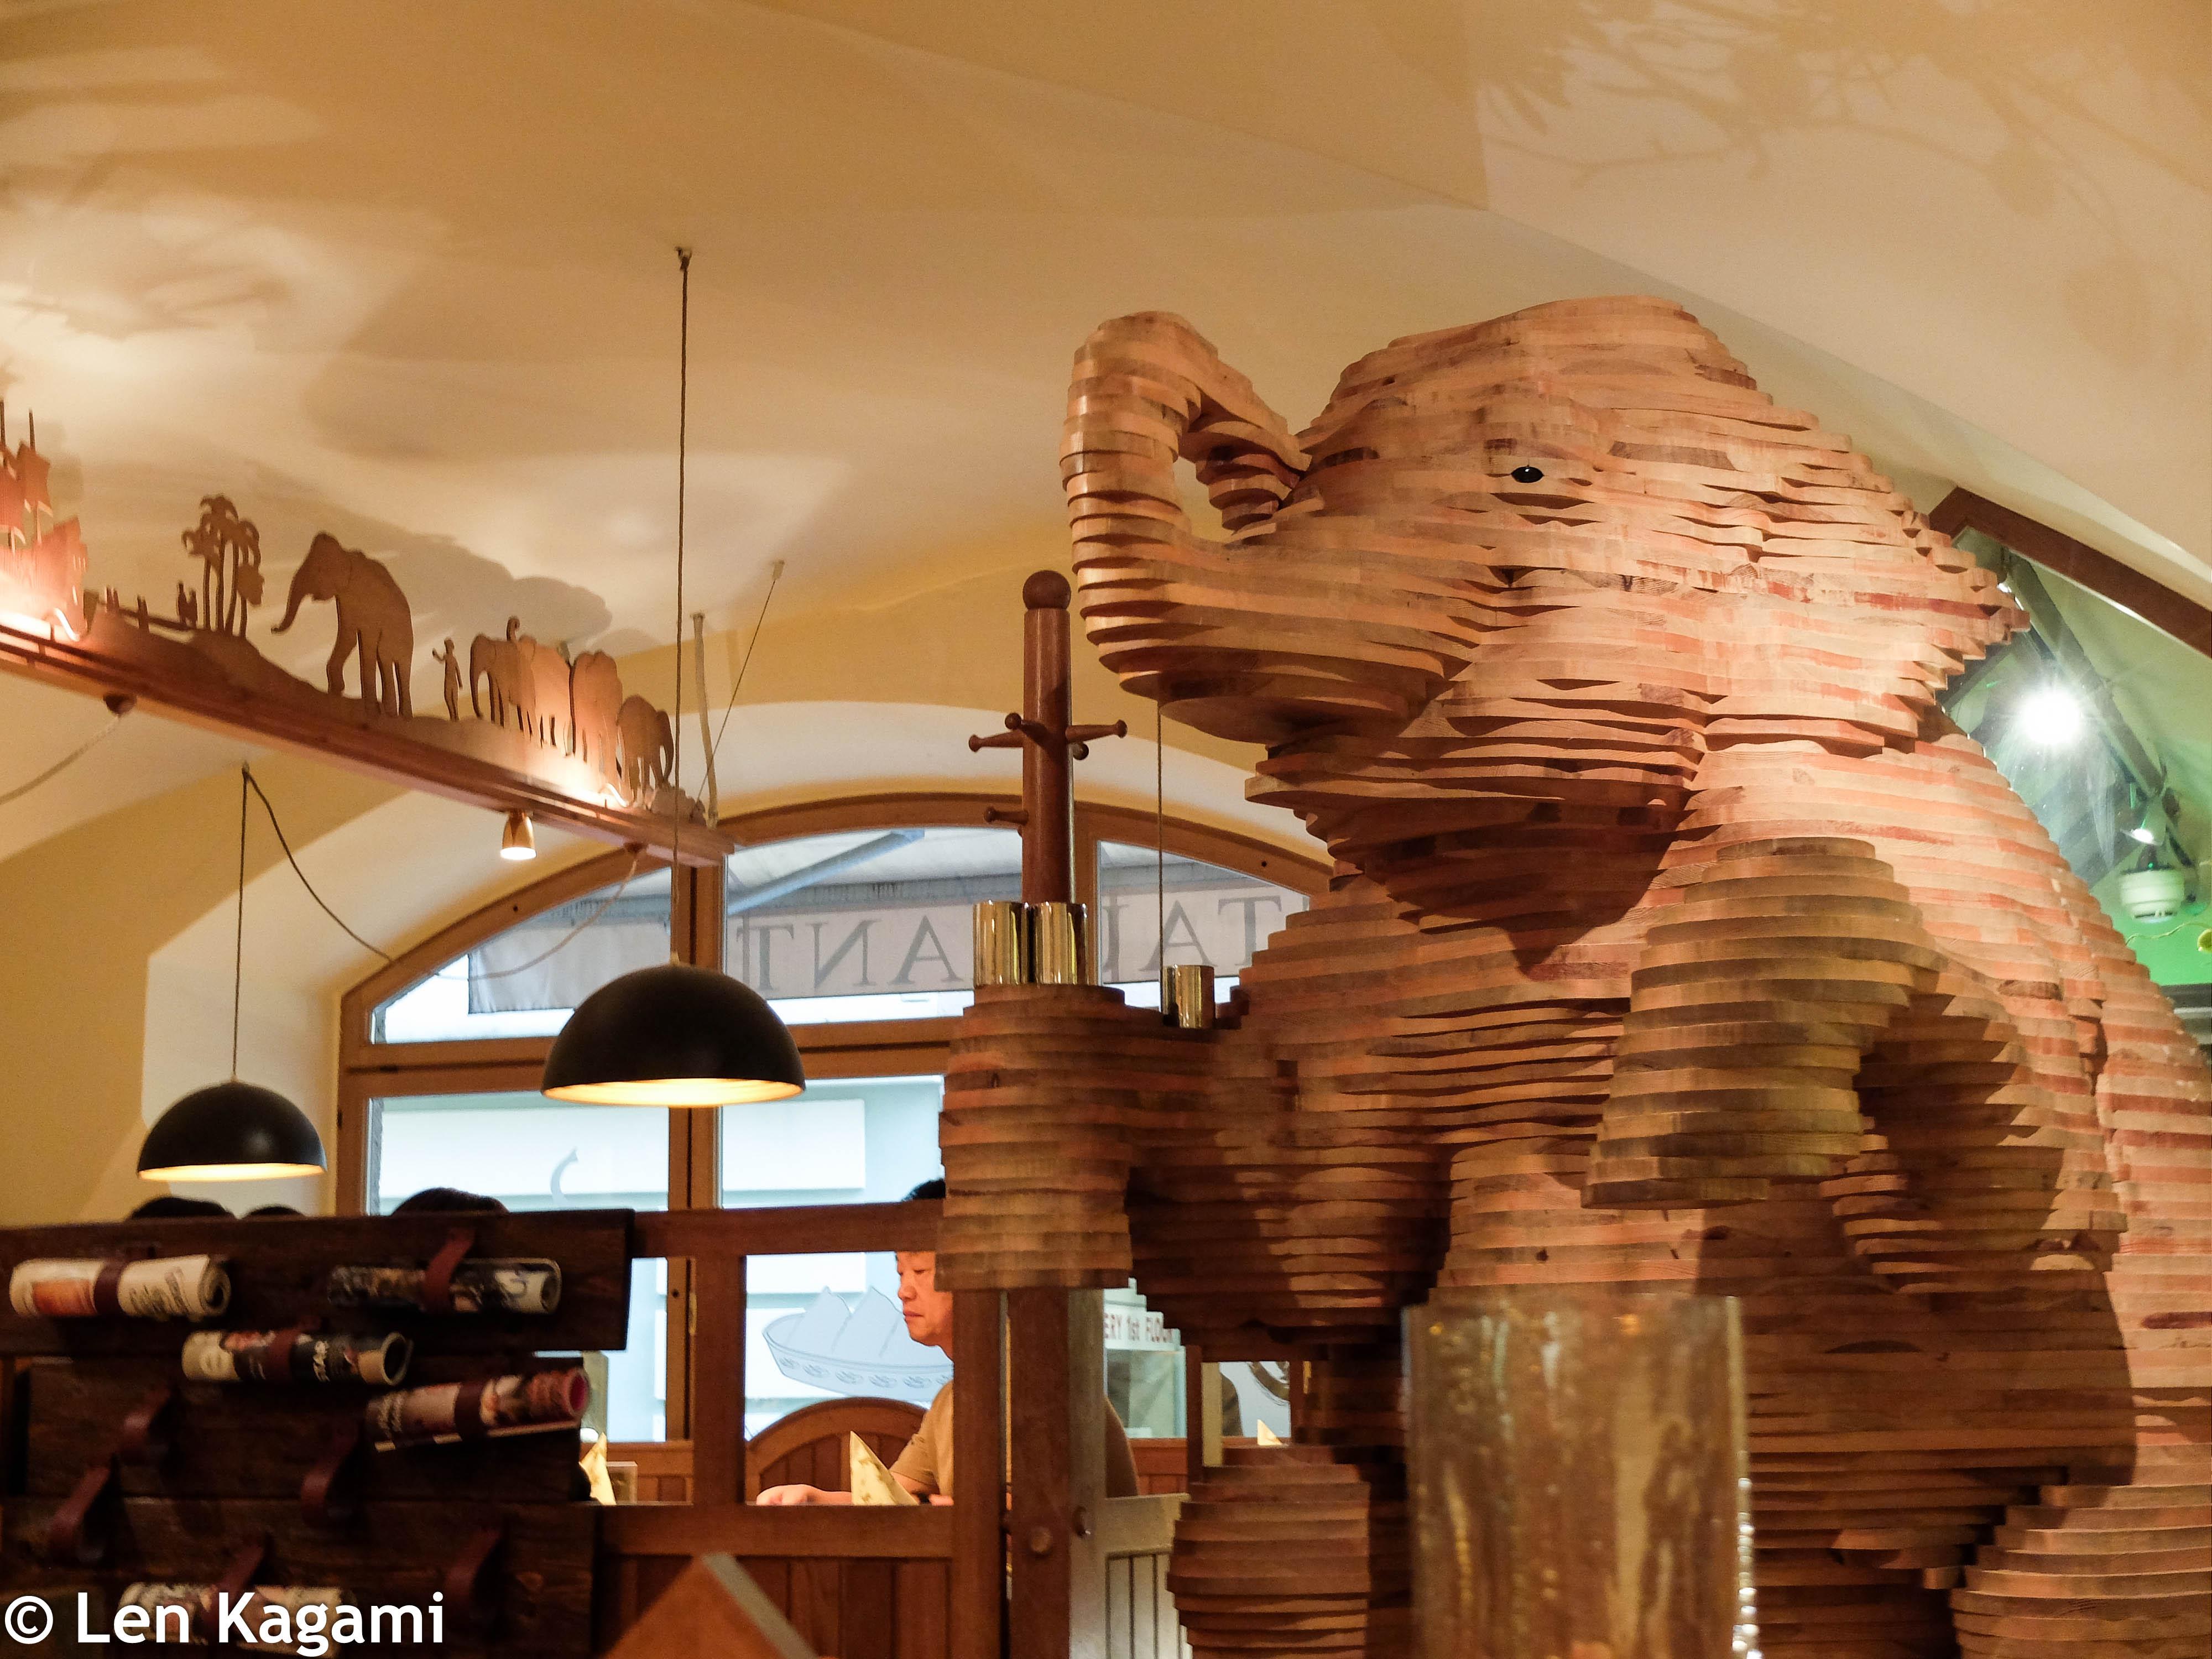 Hotel Elefant in Salzburg